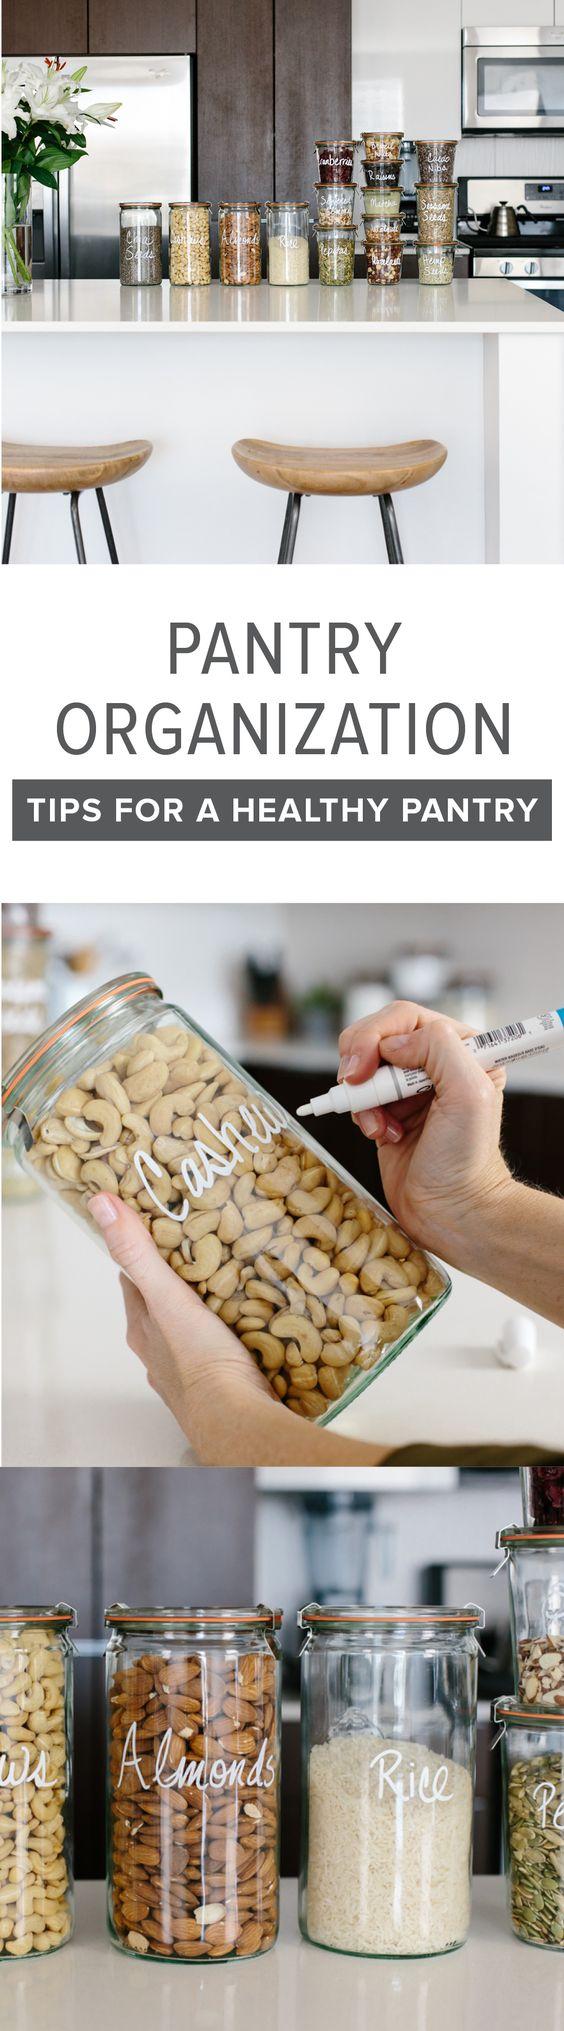 26 ideas de organizacion para alacenas